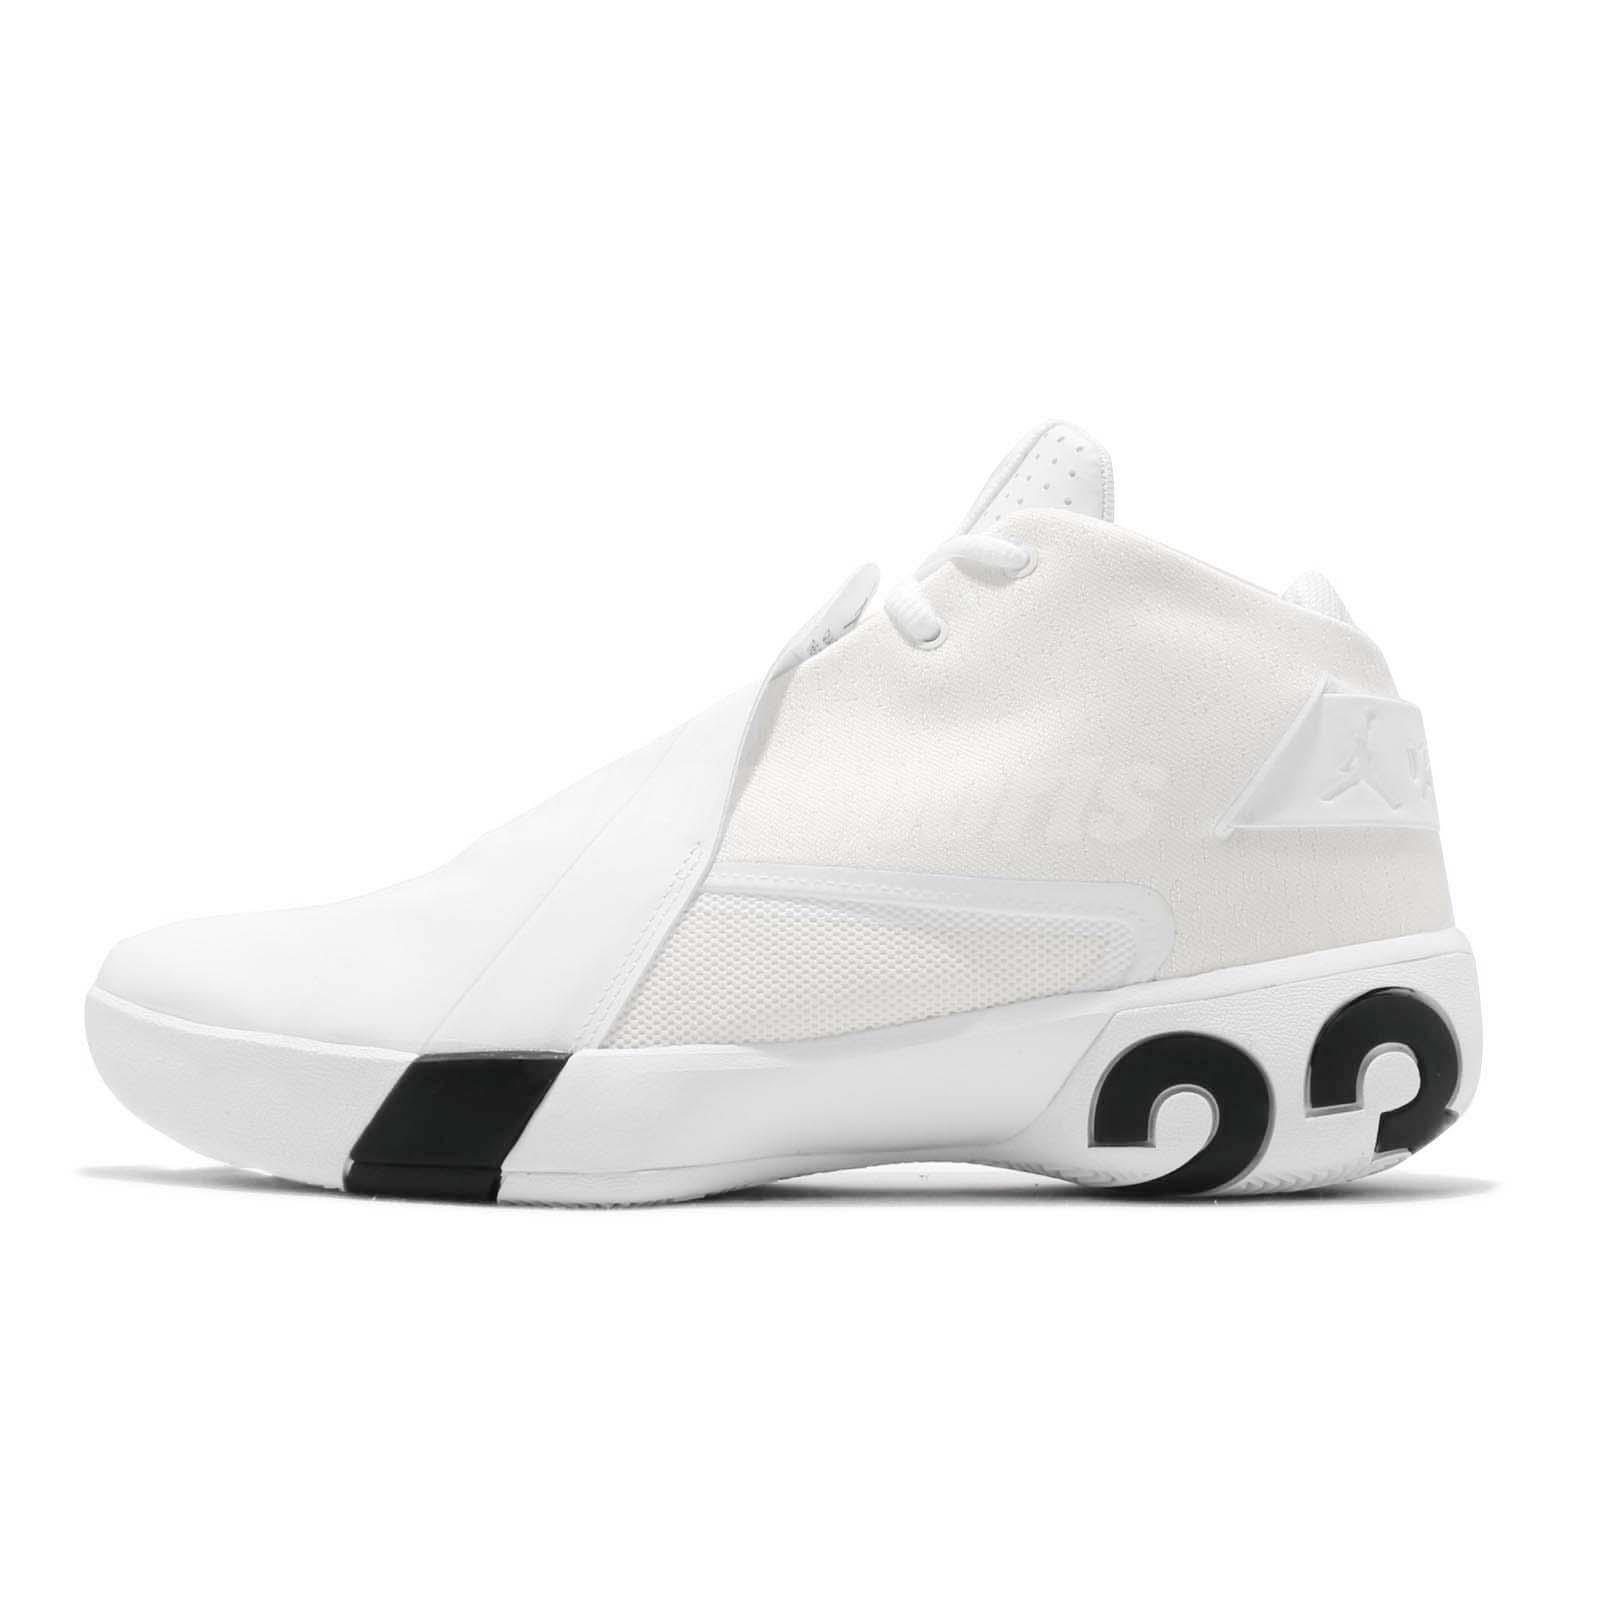 88d41f8b073c Nike Jordan Ultra Fly 3 PFX 23 White Black Men Basketball Shoes BQ6280-100